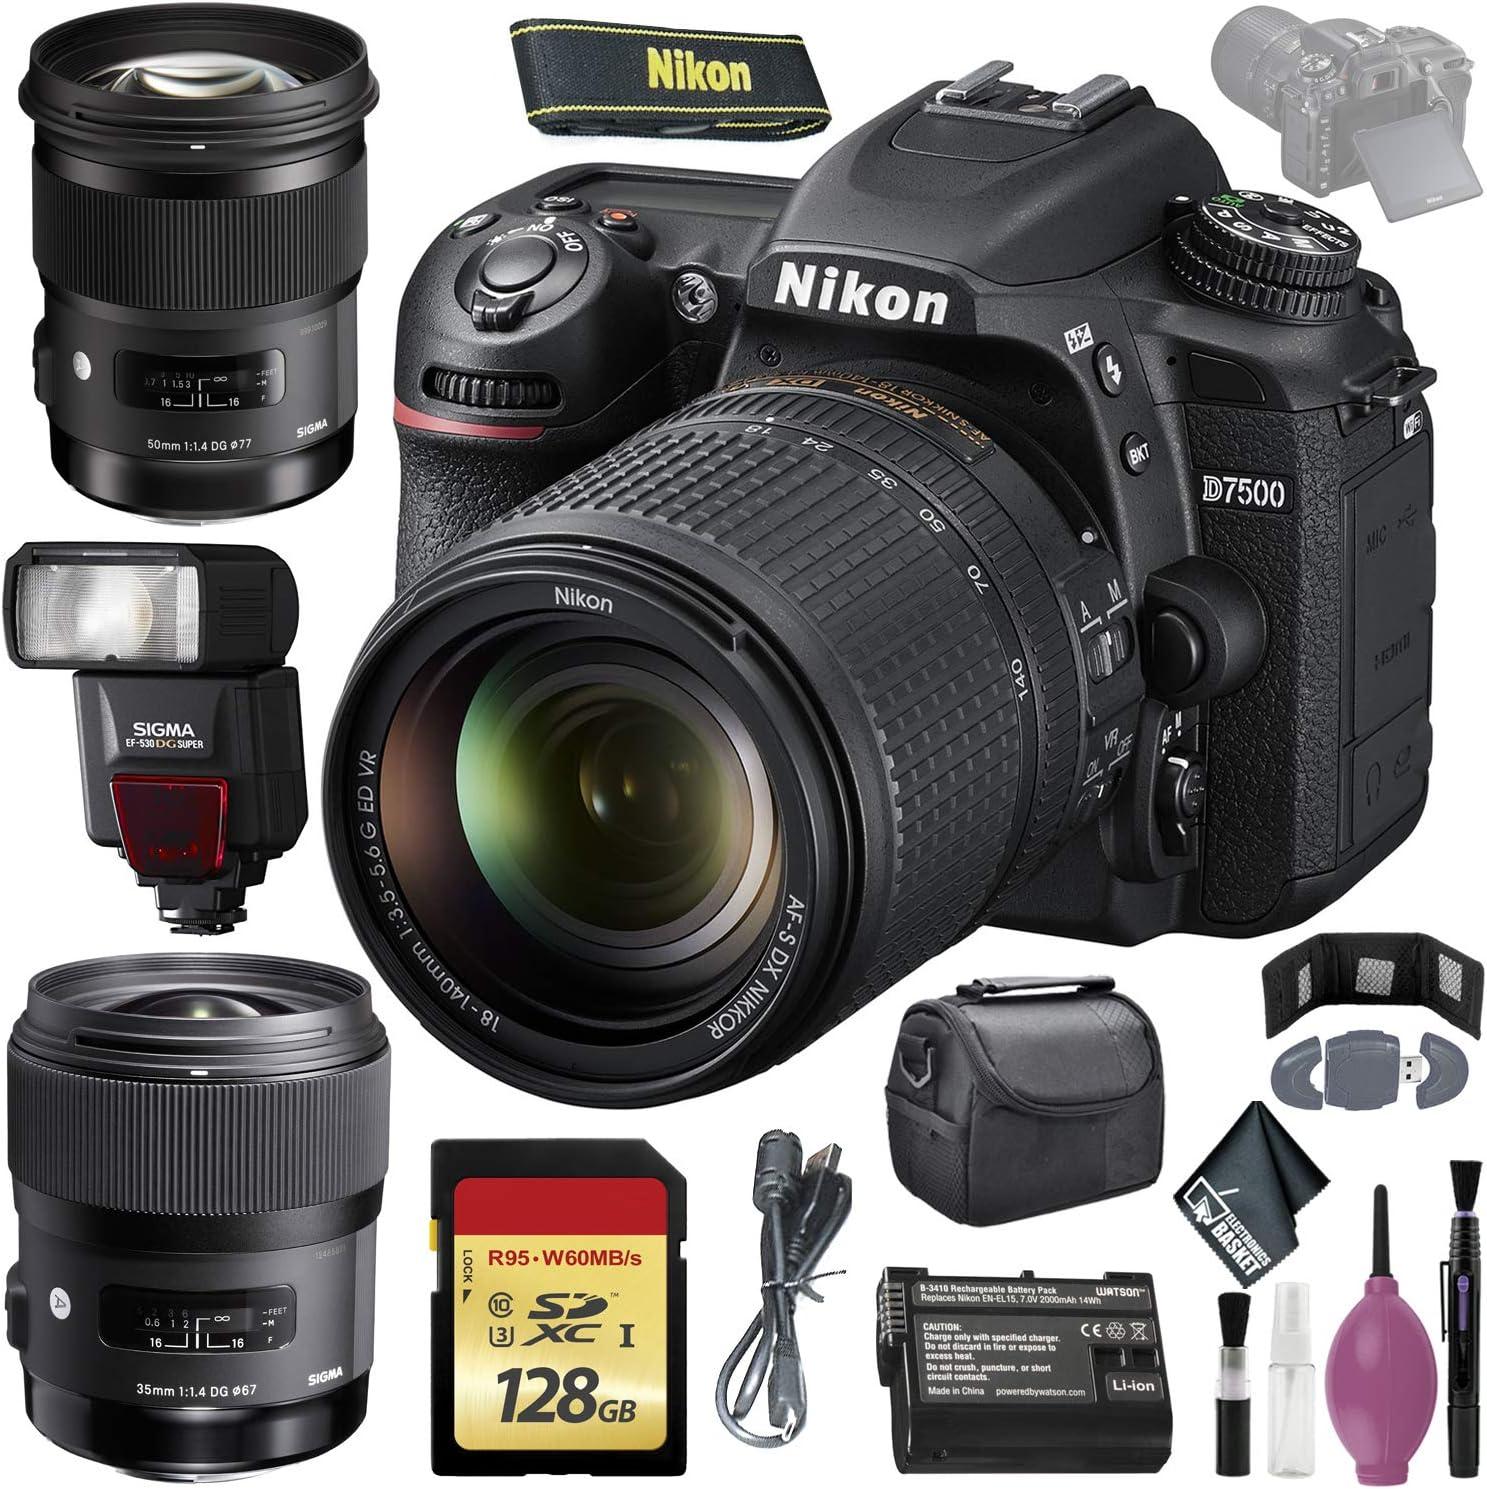 Nikon D7500 DSLR Camera w Max 70% OFF 18-140mm Lens International Model San Antonio Mall -